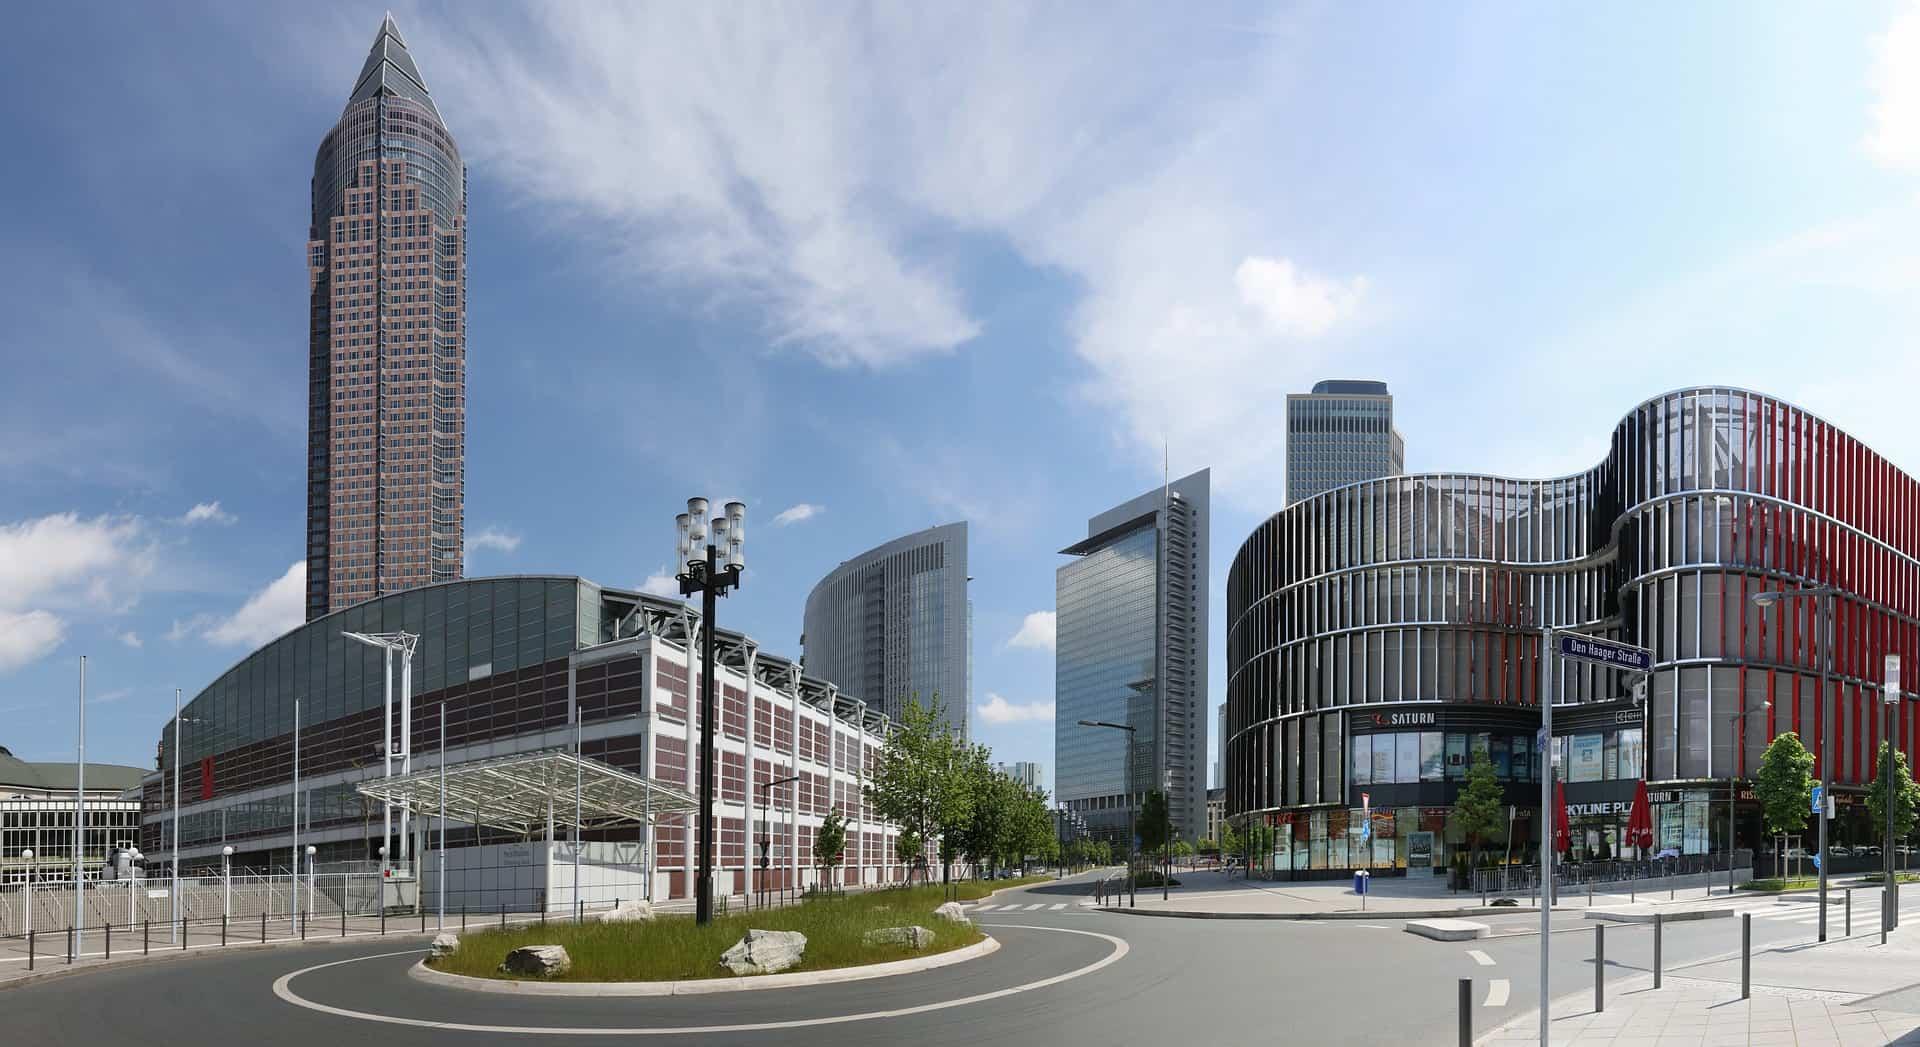 Mainhattan Frankfurt Städtereise 3 Tage nur 54,99€ Wellness